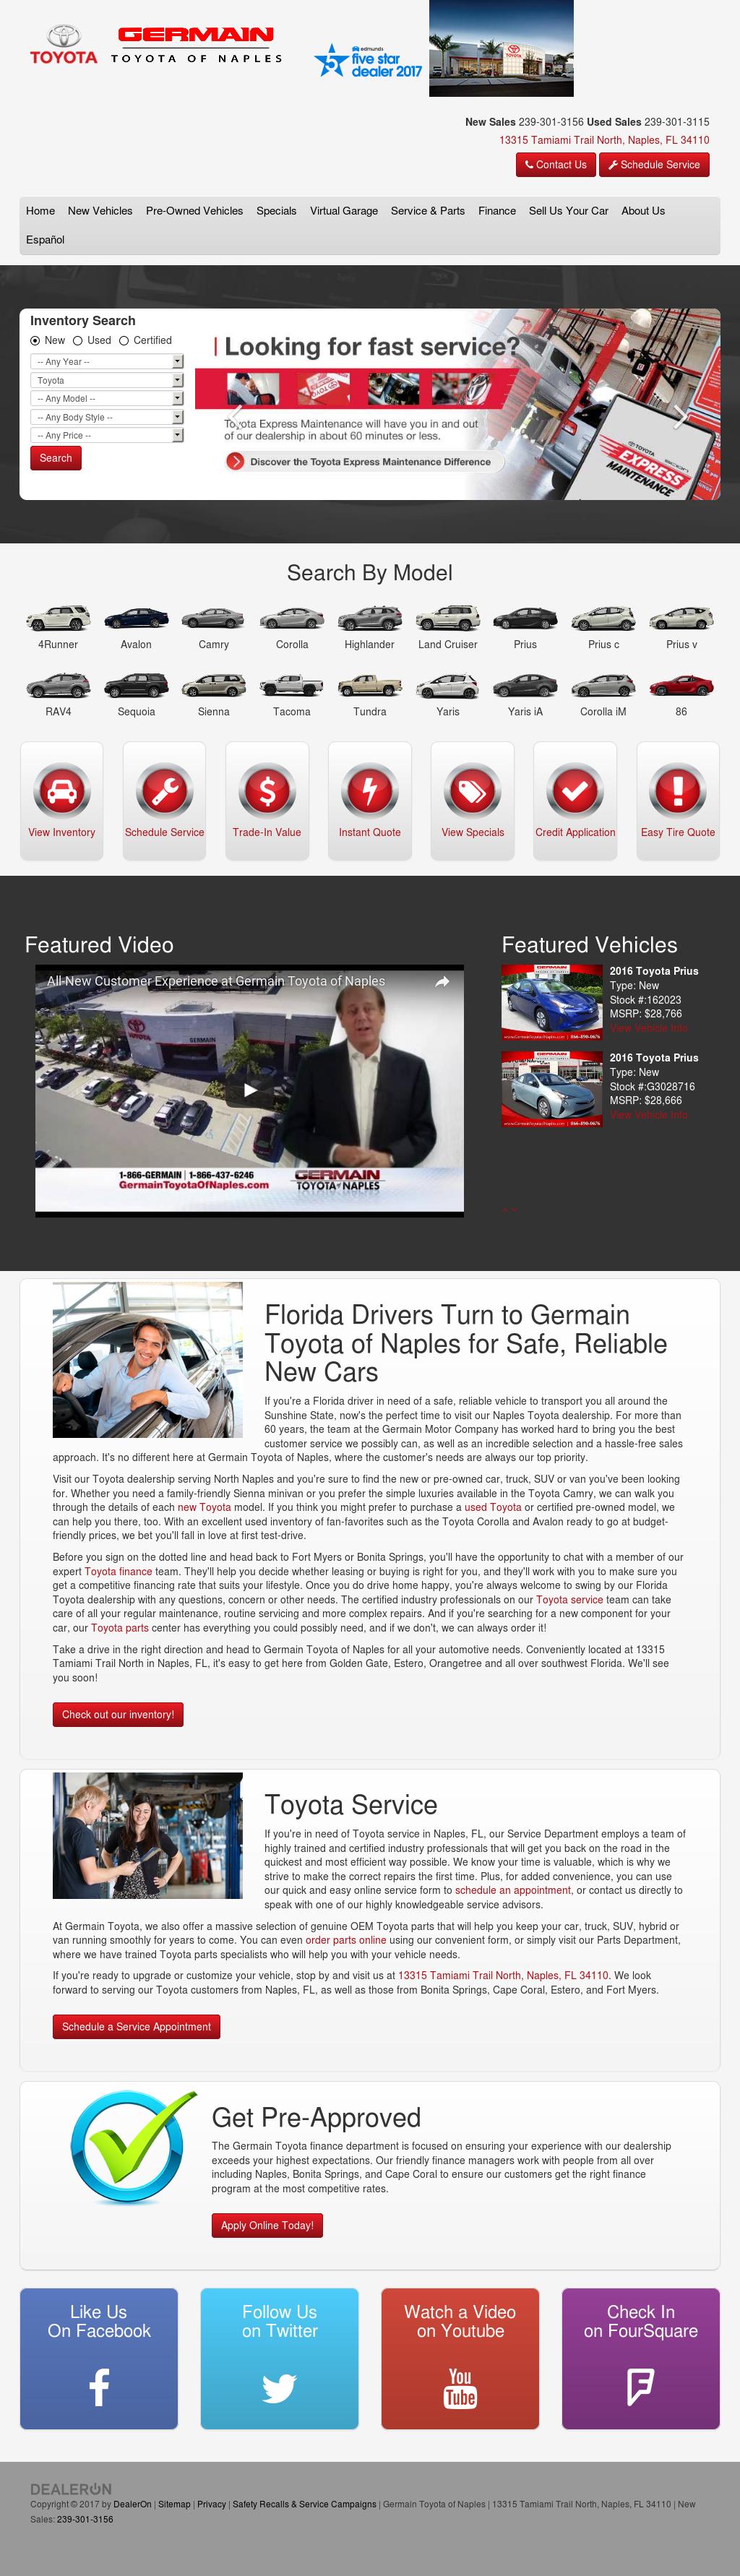 Germain Toyota Of Naples Website History